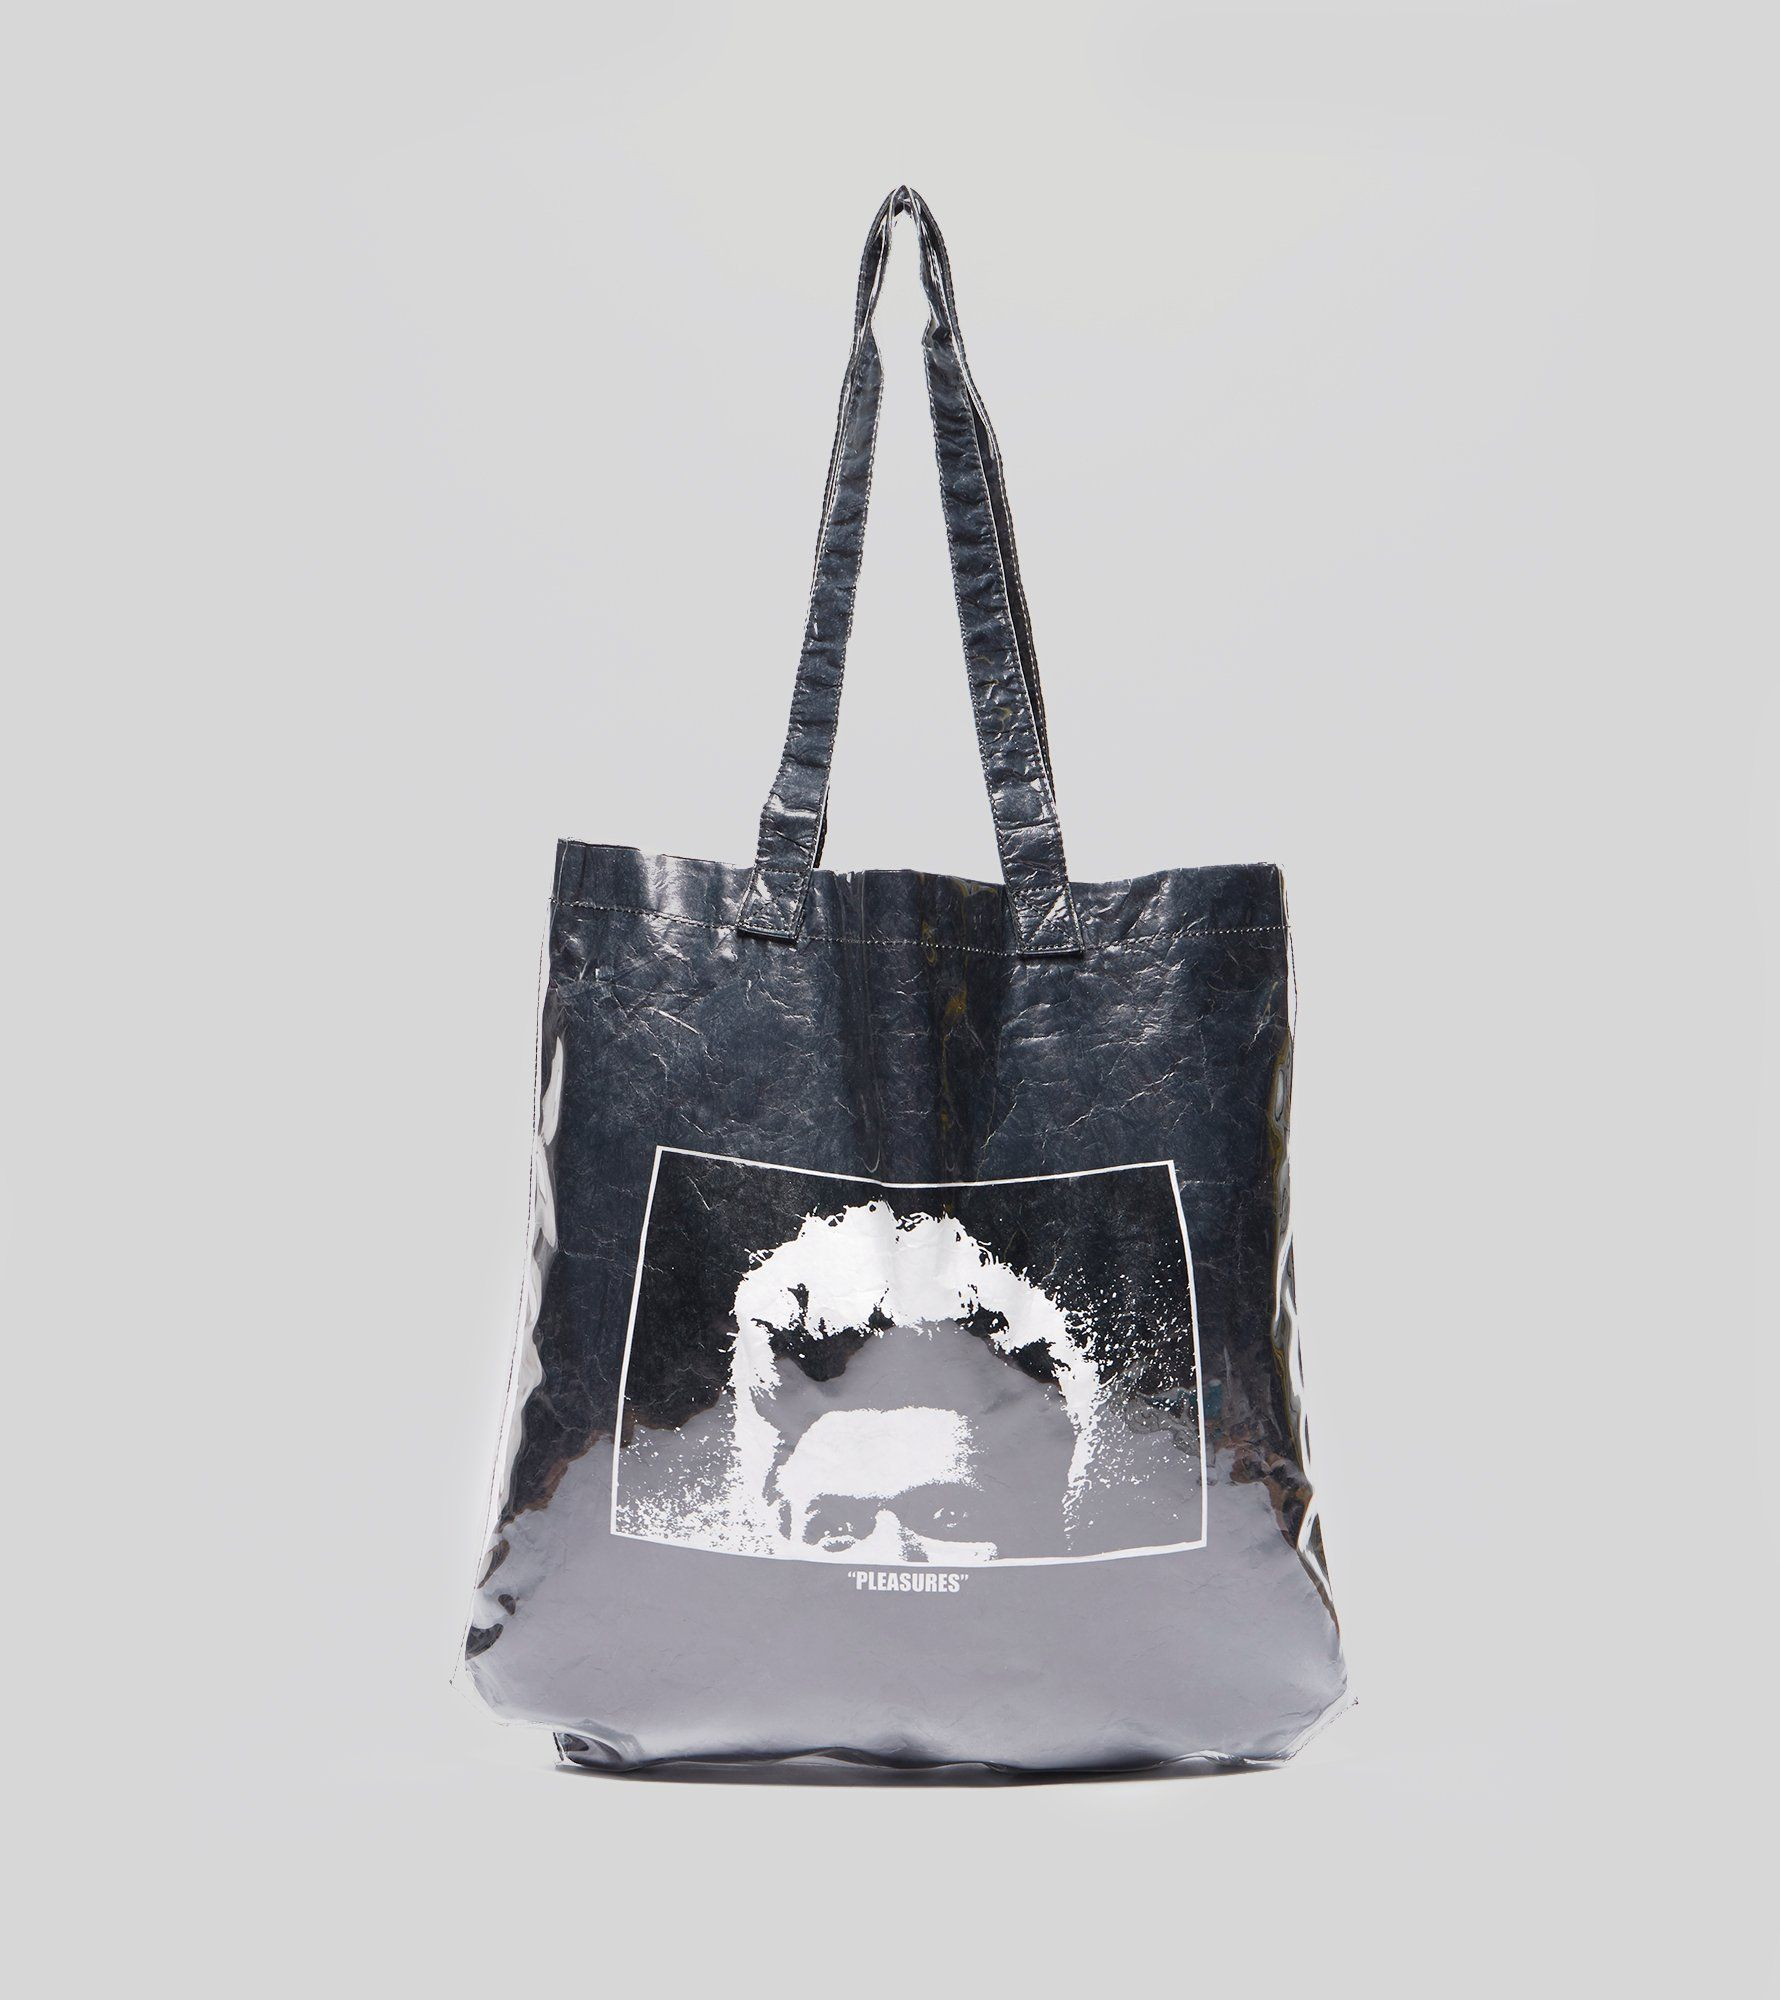 PLEASURES Dazed Plastic Tote Bag